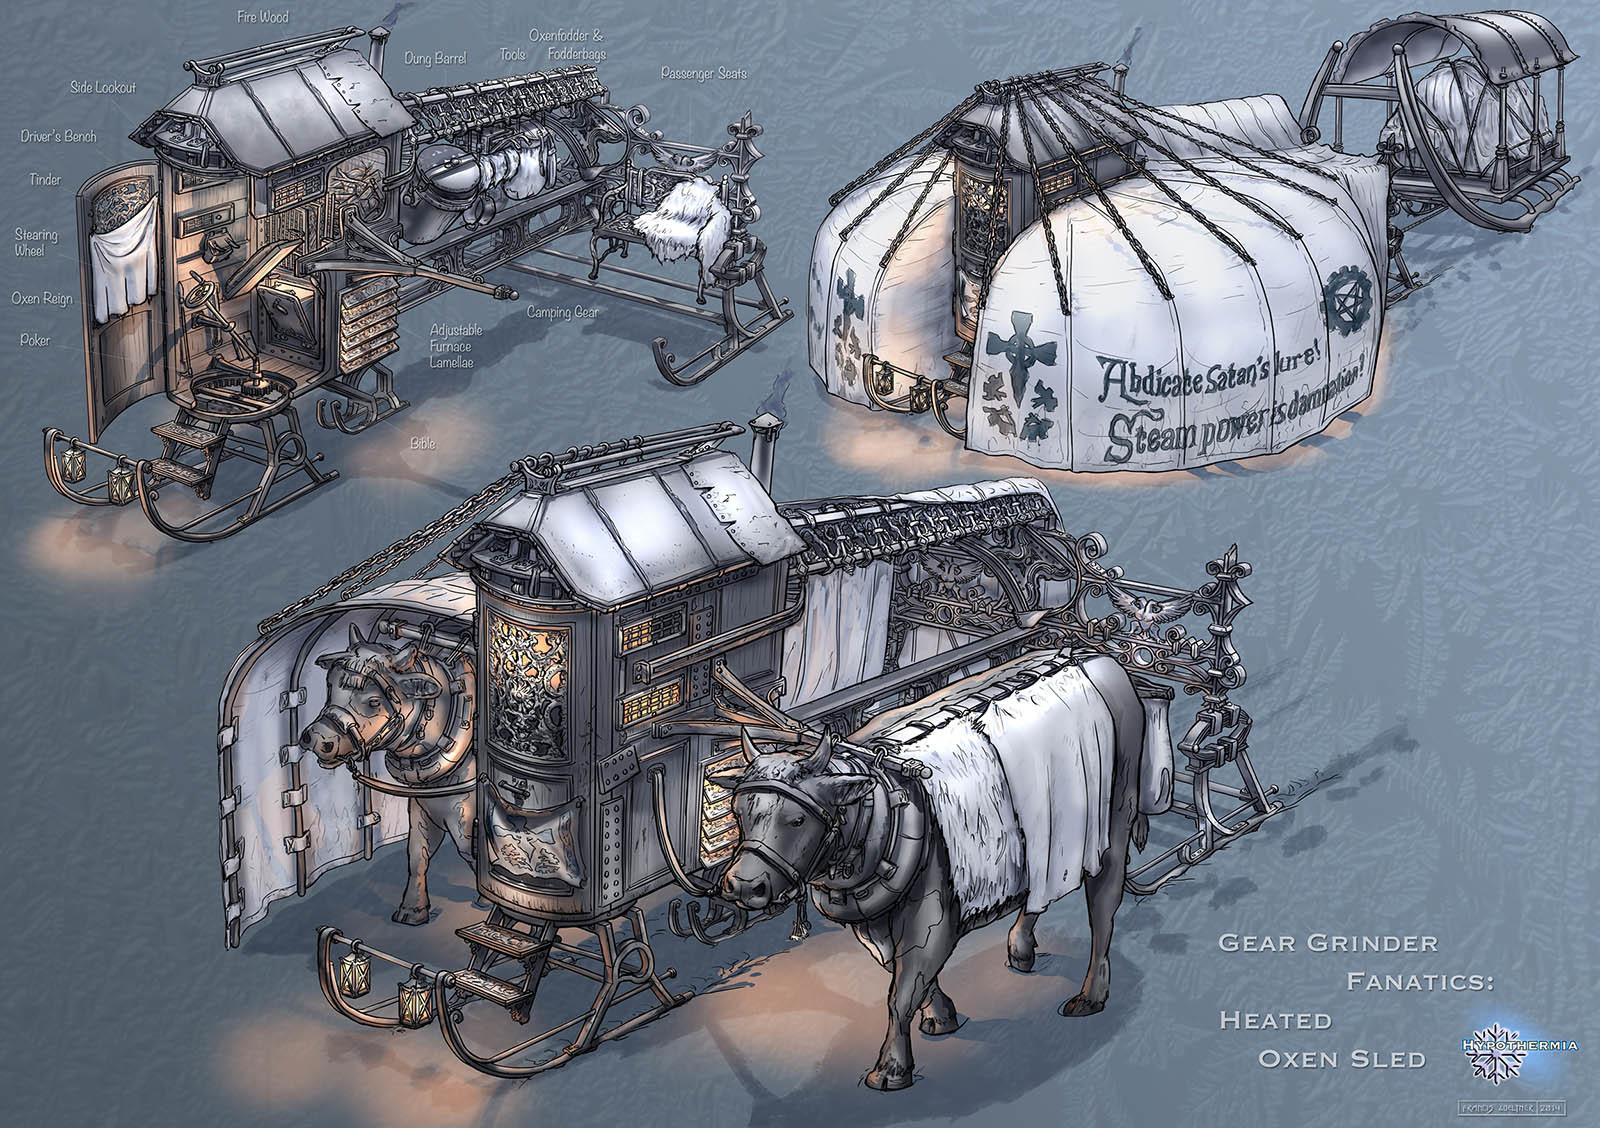 Gear Grinder Fanatics – Heated Oxen Sled